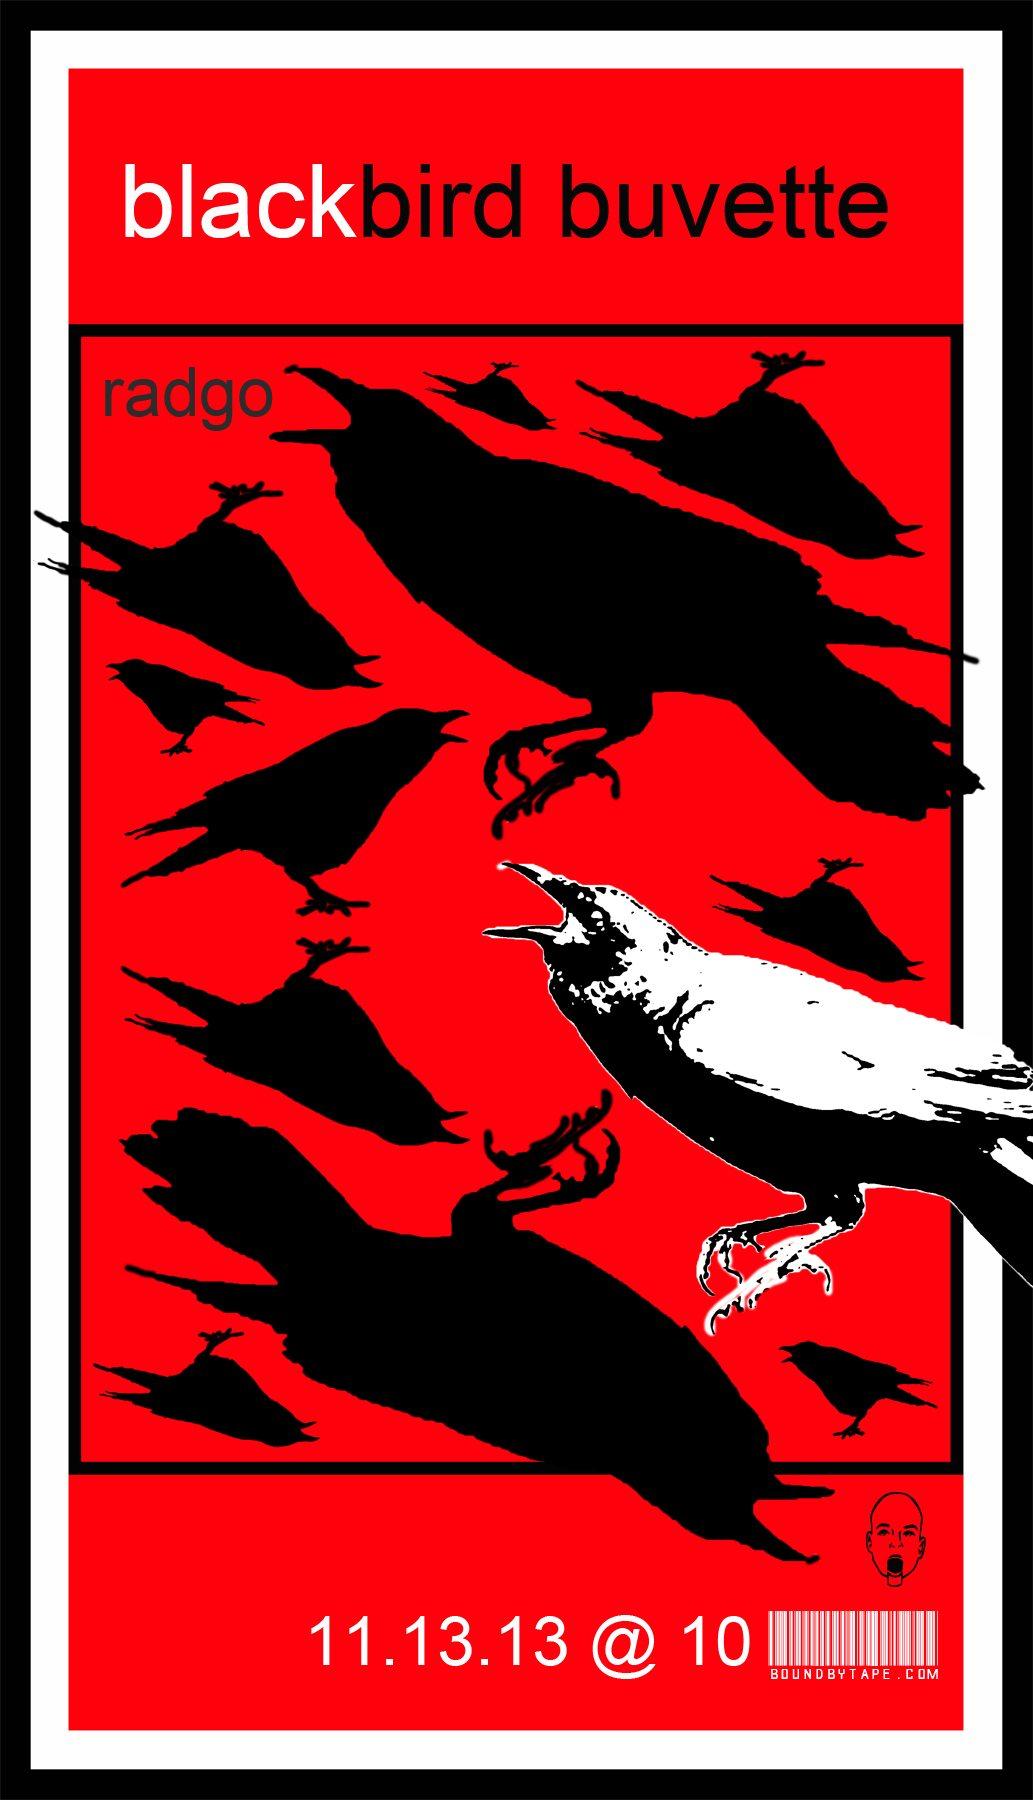 Radgo - Blackbird Buvette